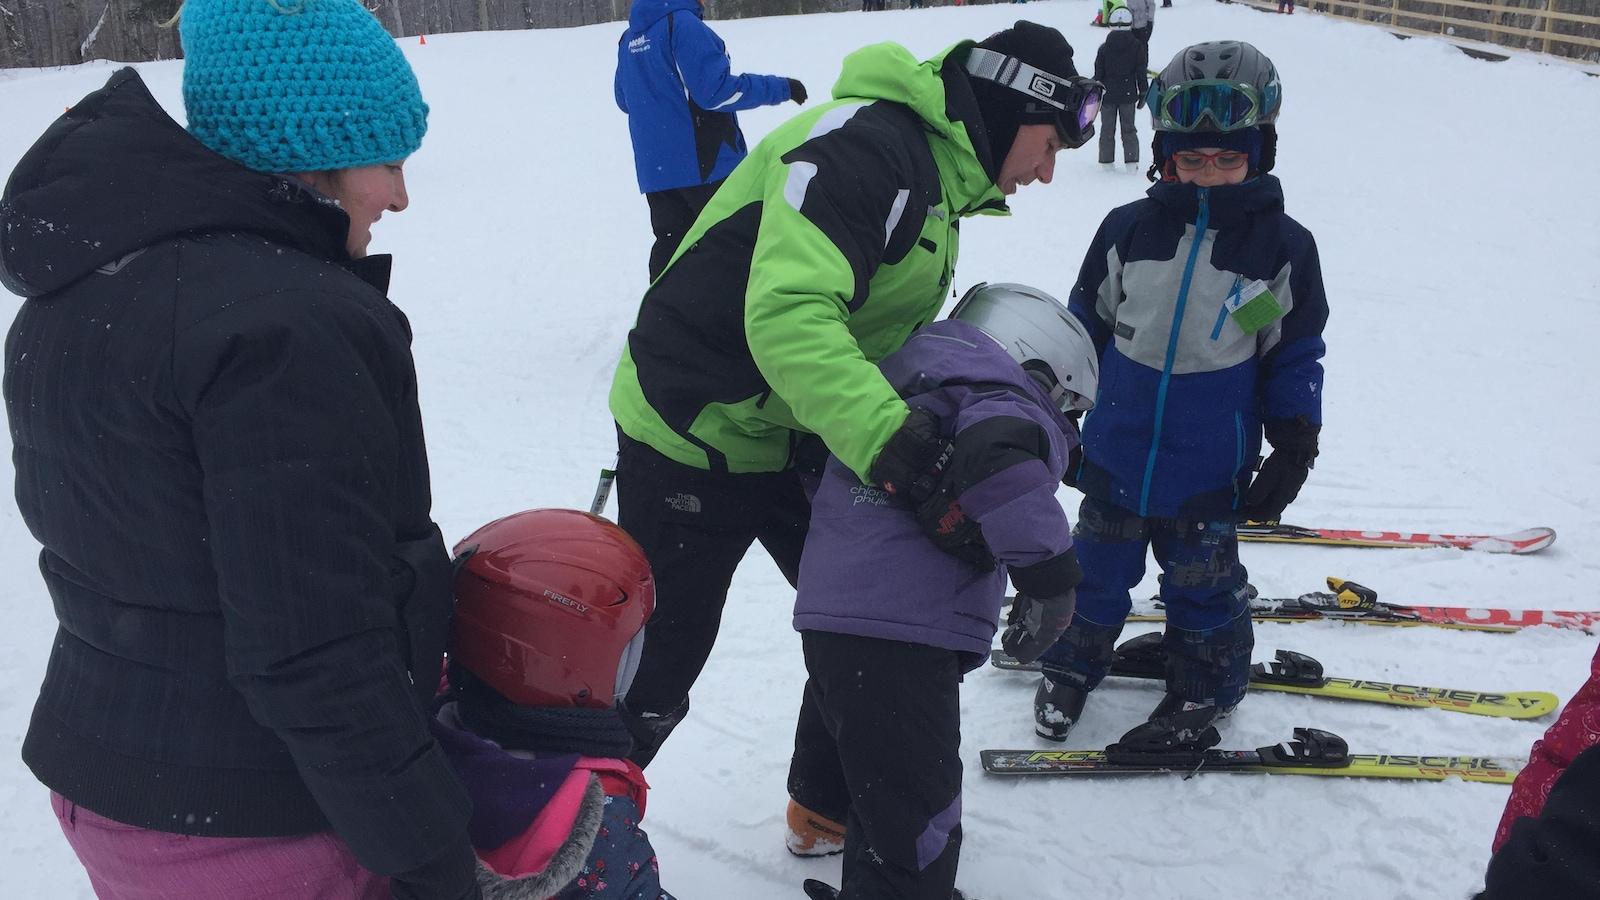 Initiation des enfants au ski, mont kanasuta